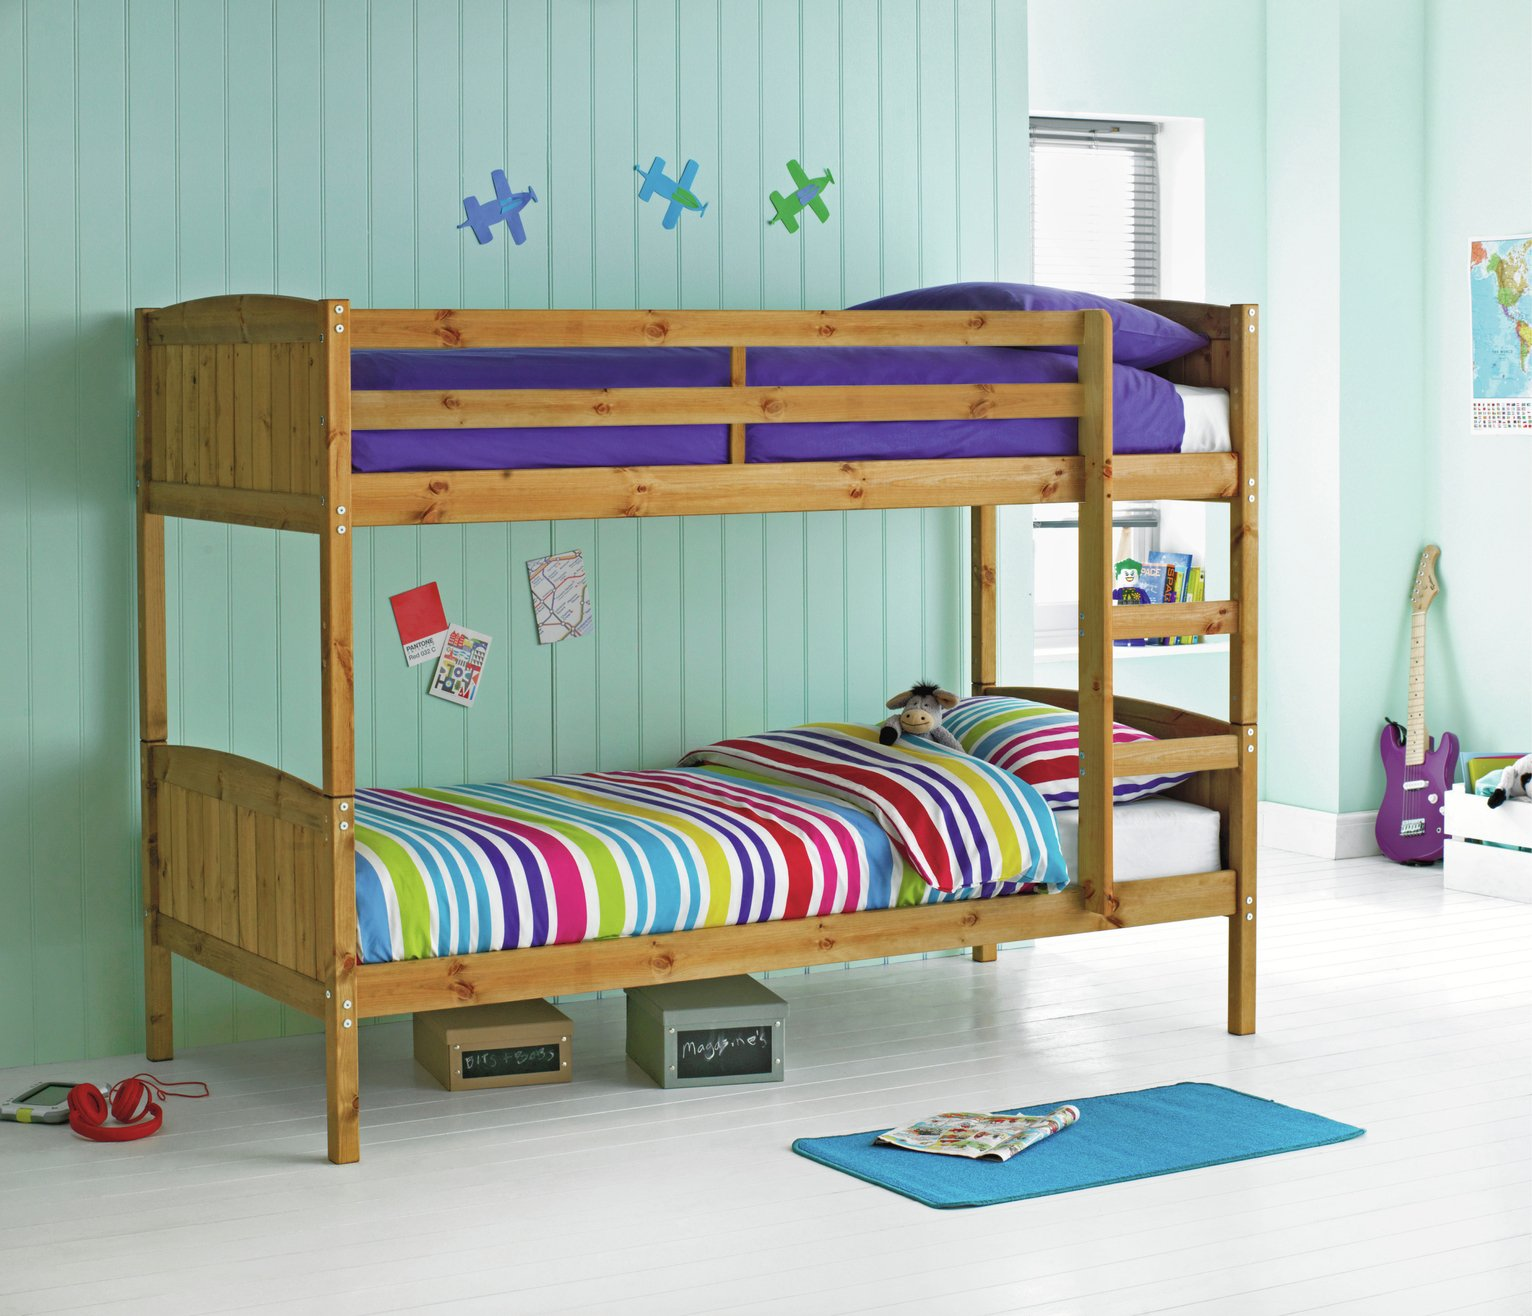 Picture of: Argos Home Detachable Pine Bunk Bed 2 Kids Mattresses 4822480 Argos Price Tracker Pricehistory Co Uk